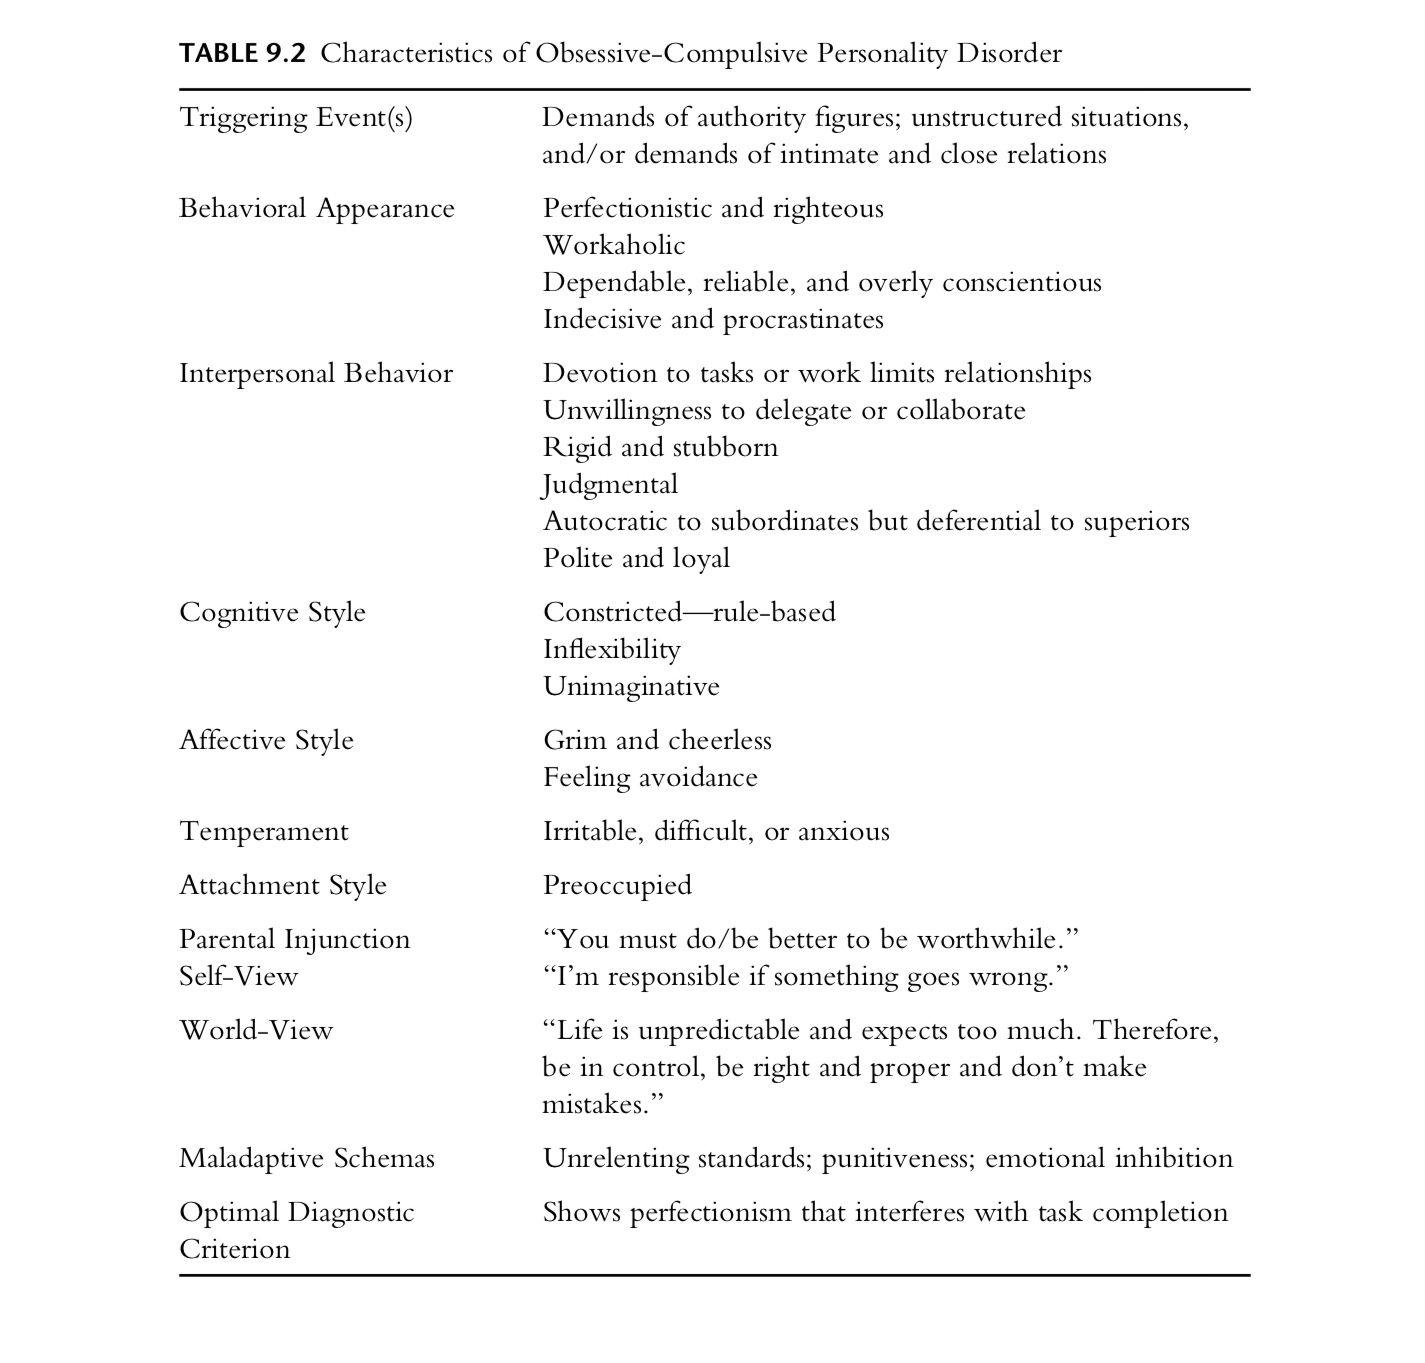 Obsessive compulsive personality disorder job resume